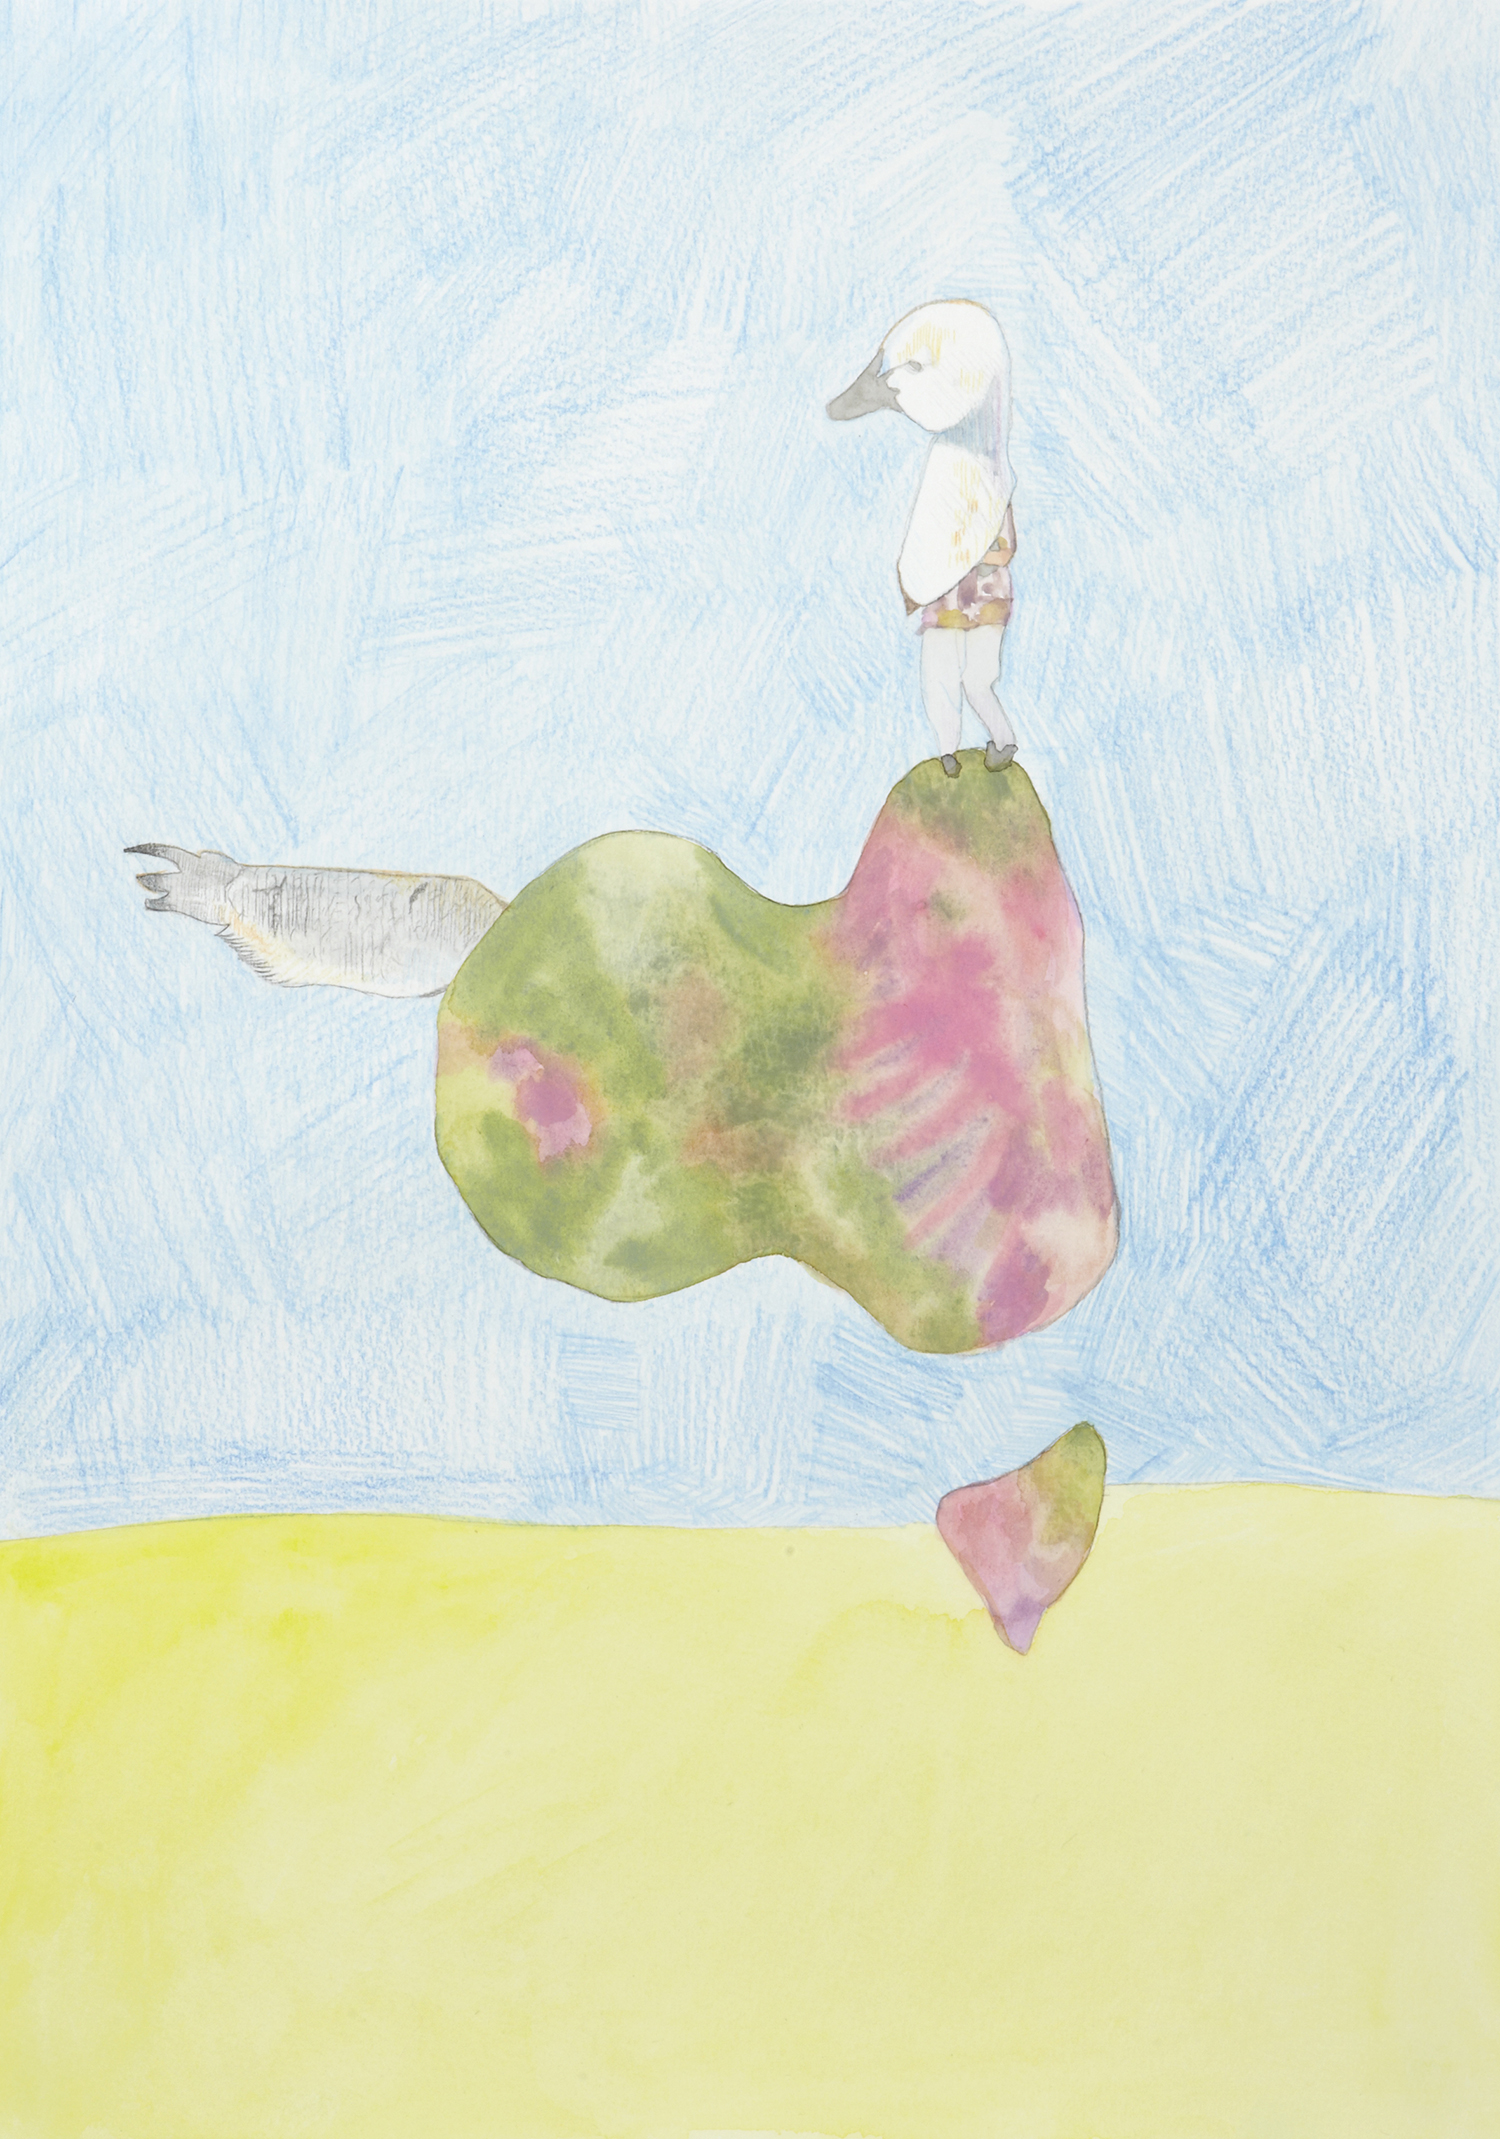 Australia #3, 2012, Watercolour and pencil on paper, 29.7 x 42.0 cm, Photo: Sam Scoufos